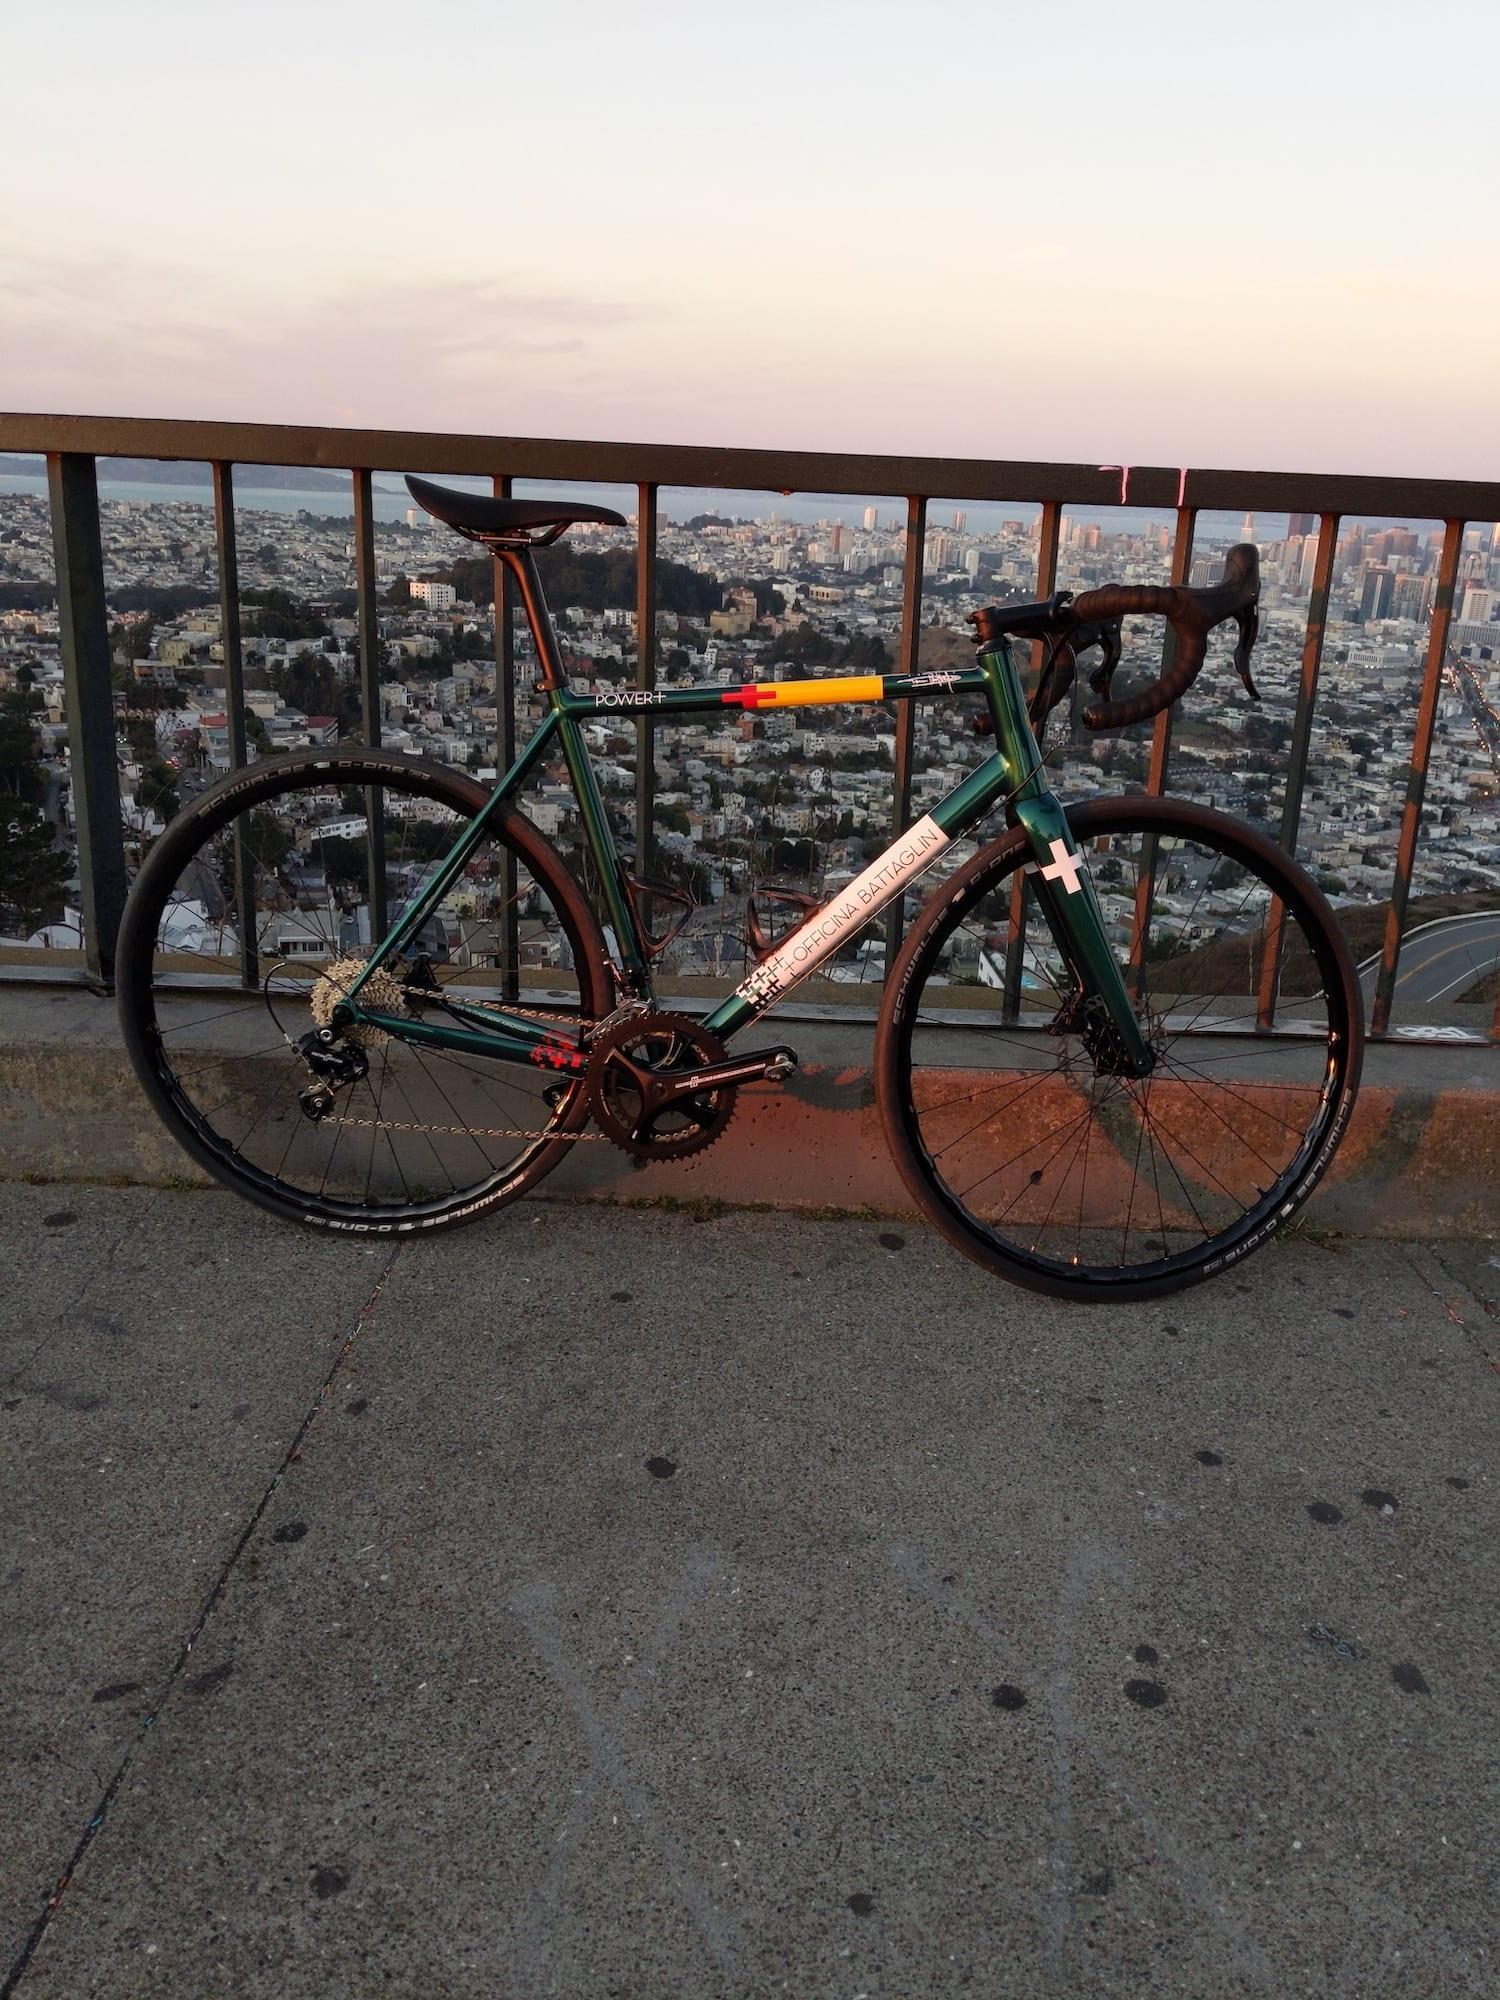 officina-battaglin-custom-steel-bike-power-plus-all-road-bike.jpg